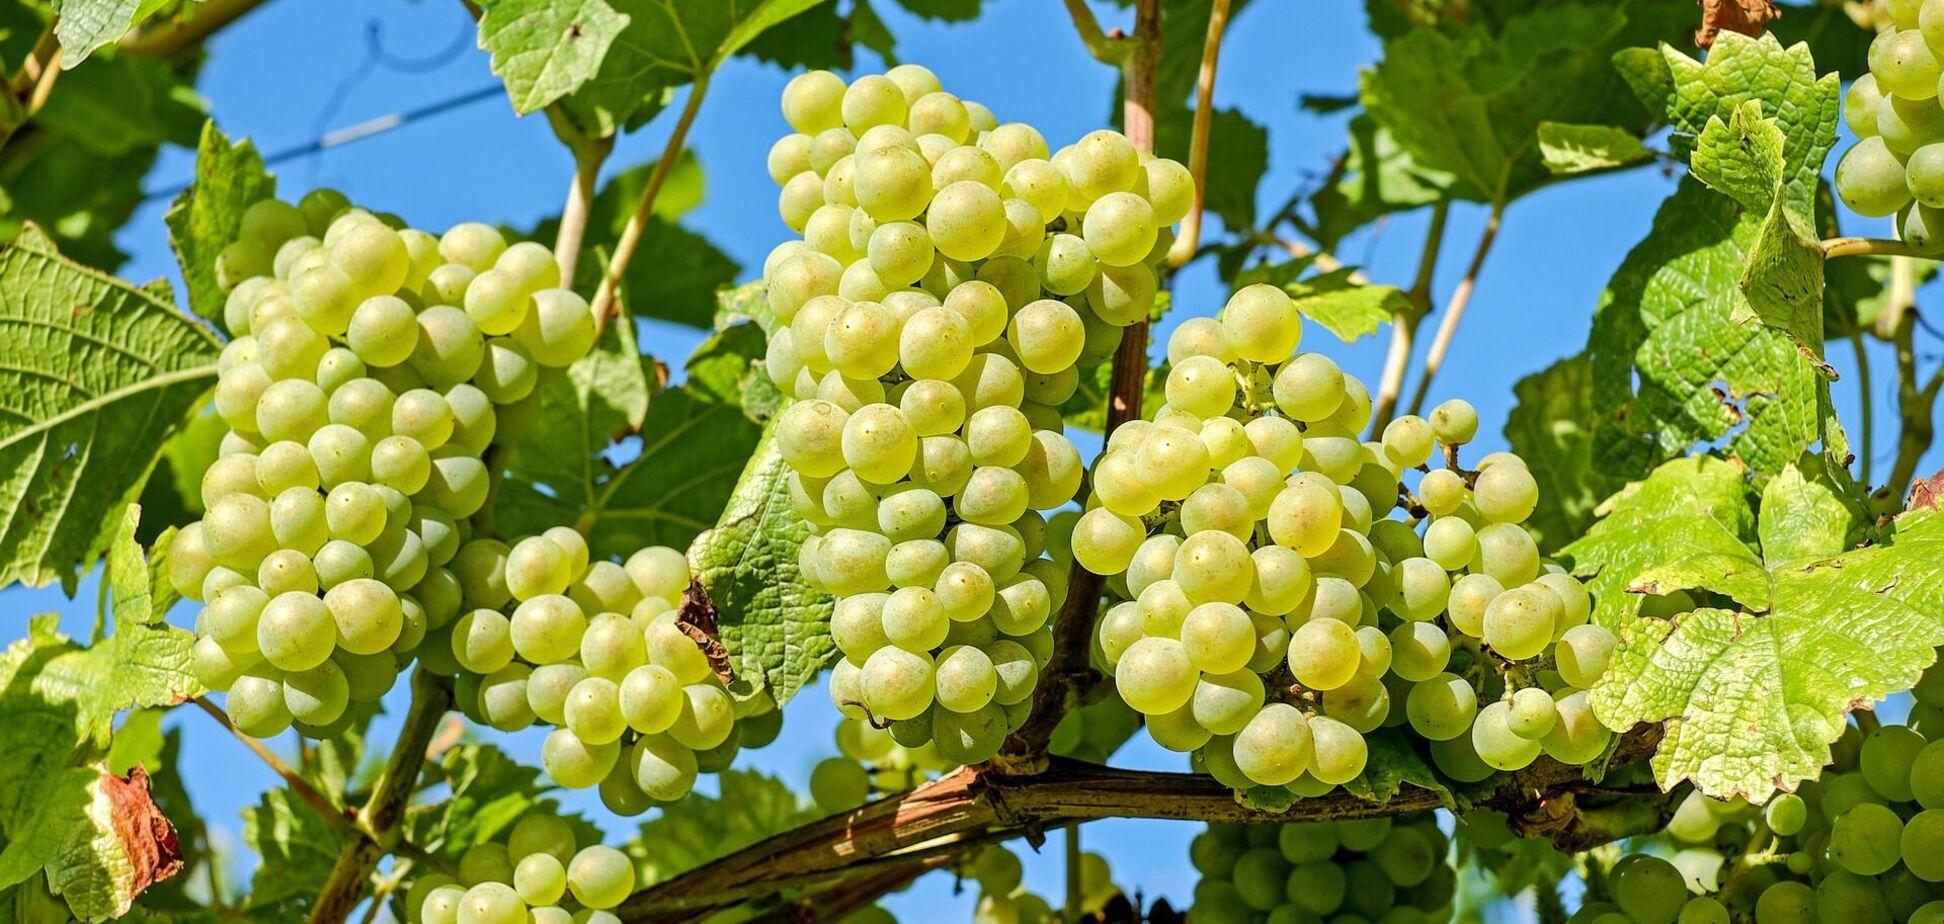 Цены на виноград в Украине обвалились